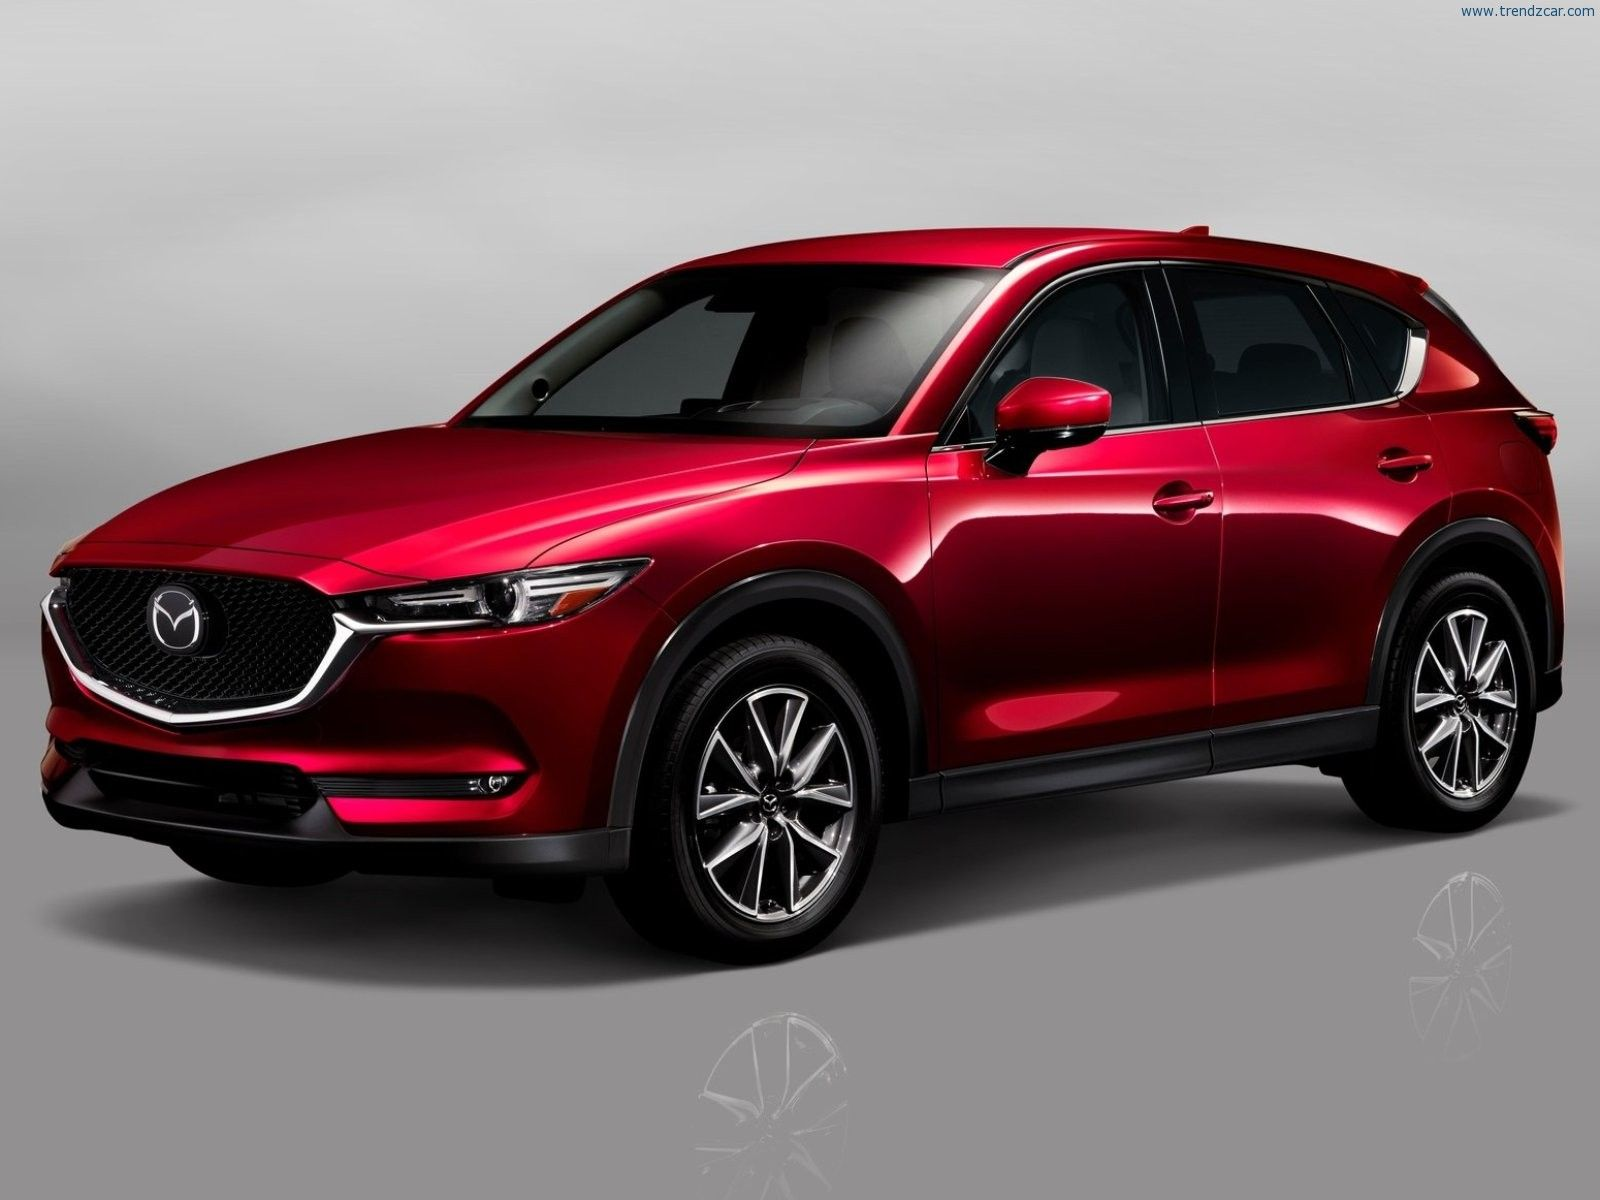 2017 Mazda CX5 Mazda, Suv, Mazda suv